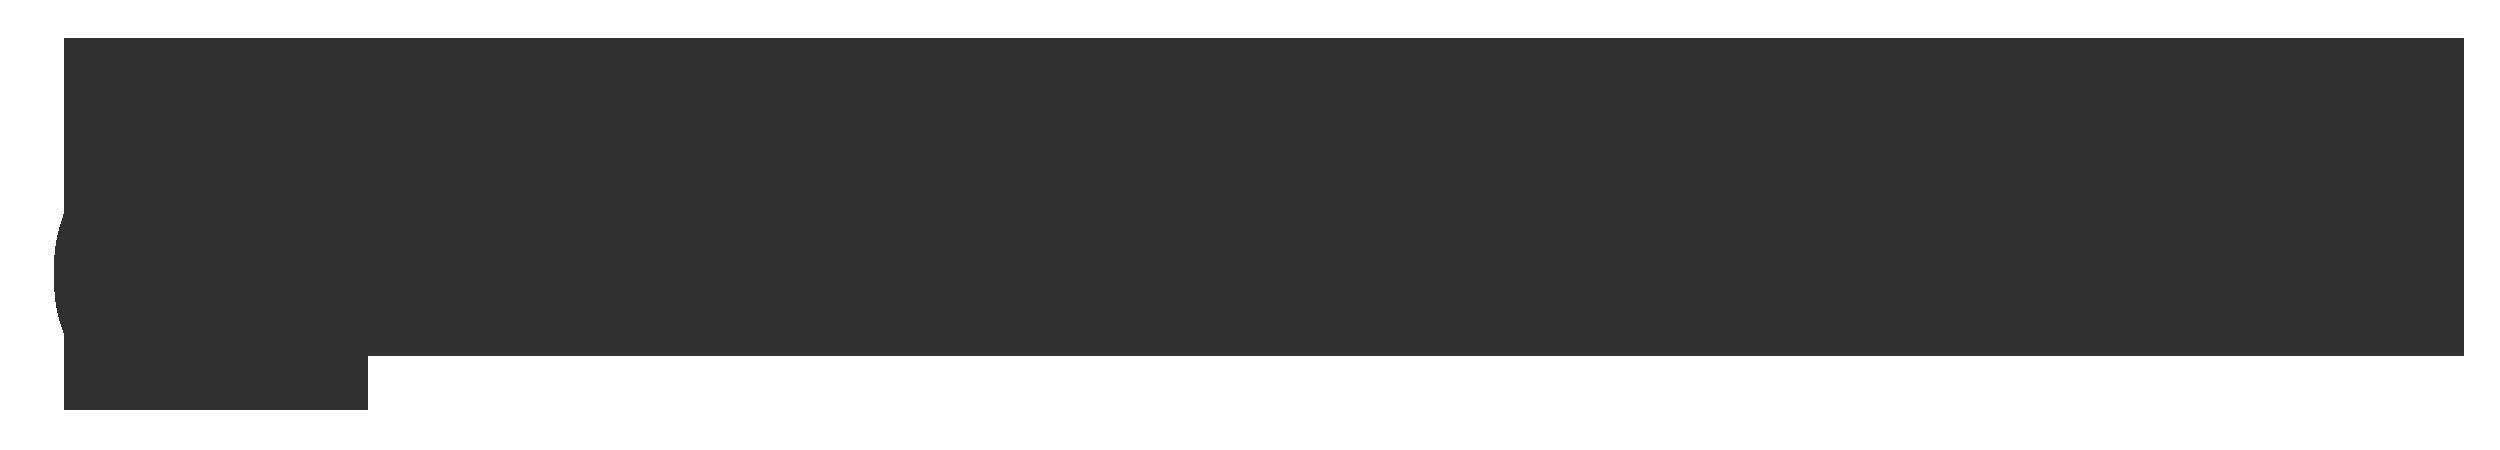 Champion Site Prep, inc